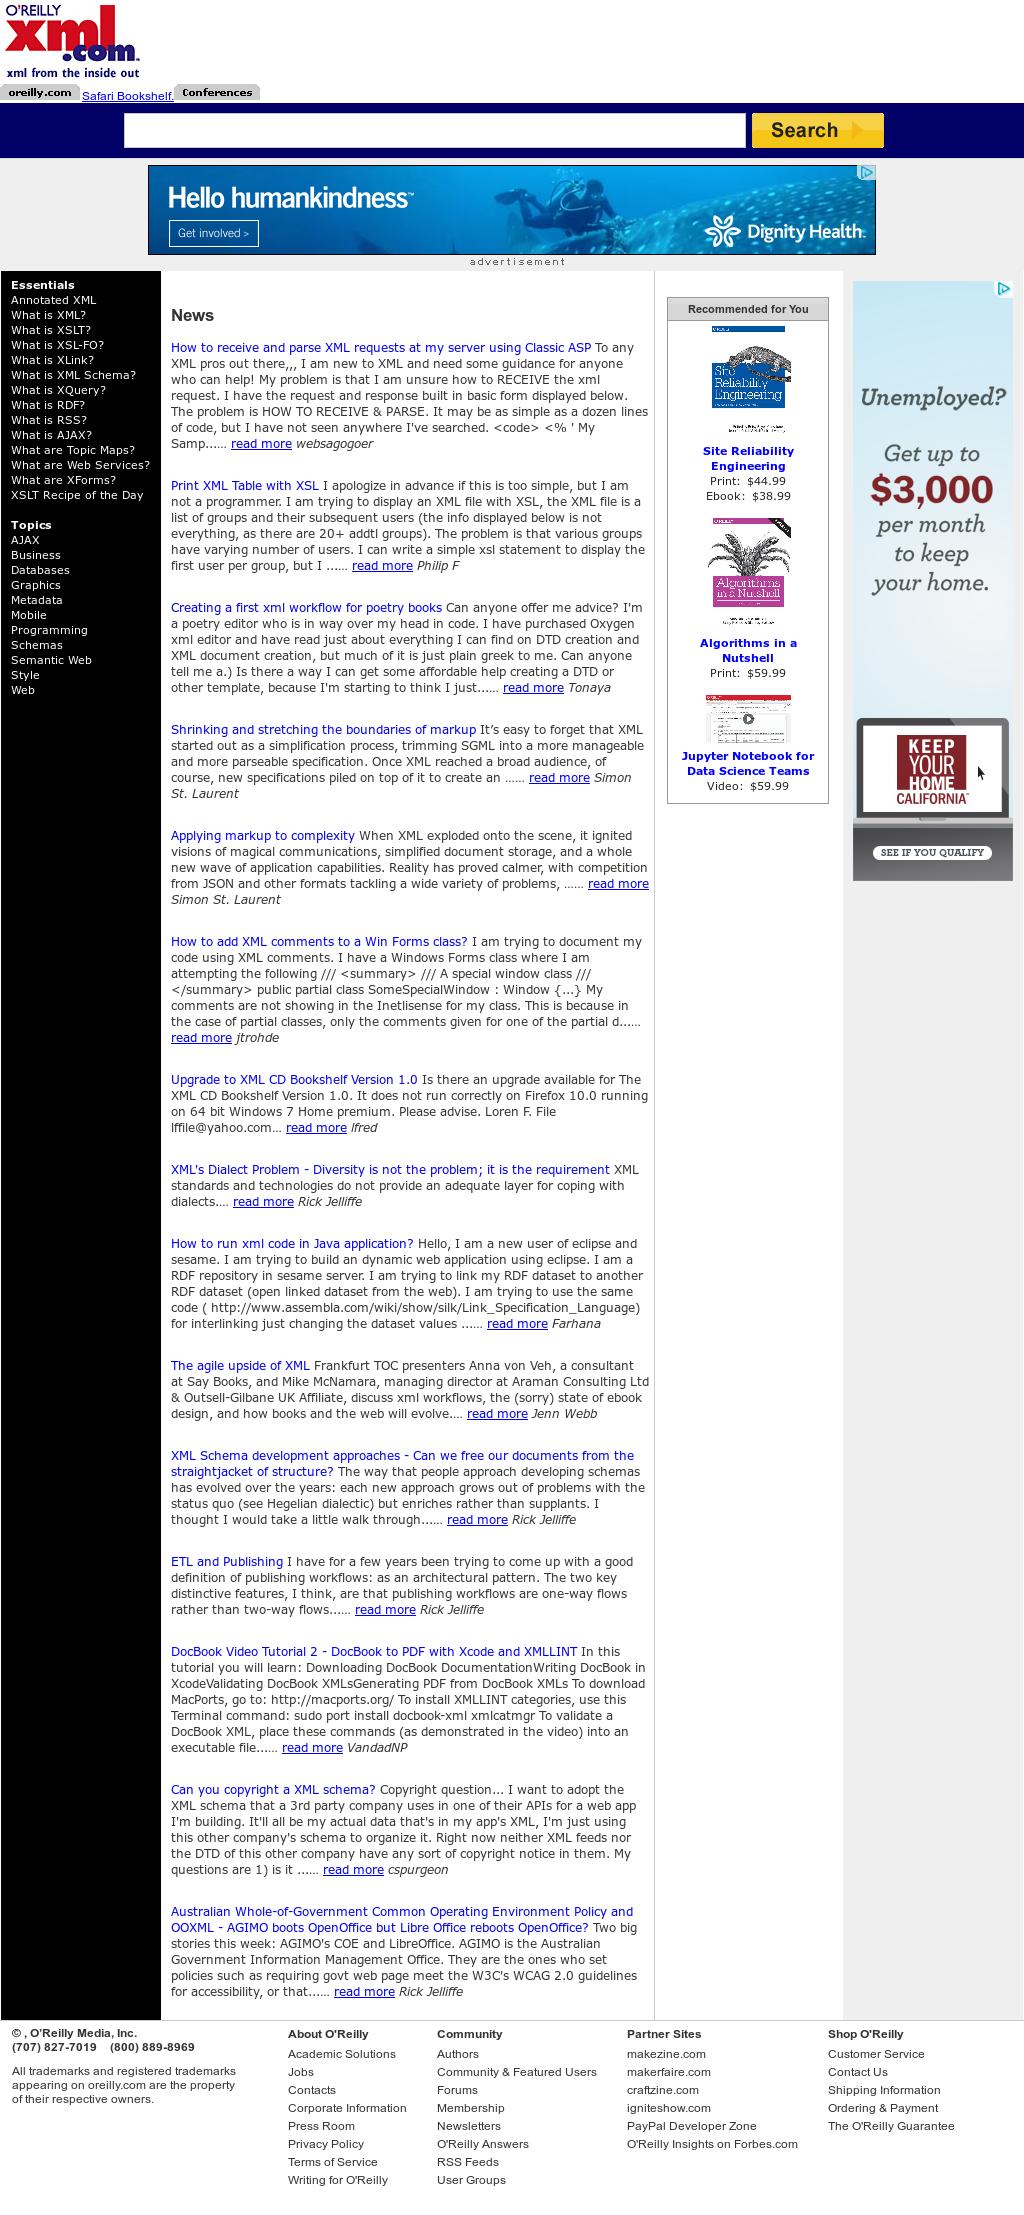 xml in nutshell pdf download